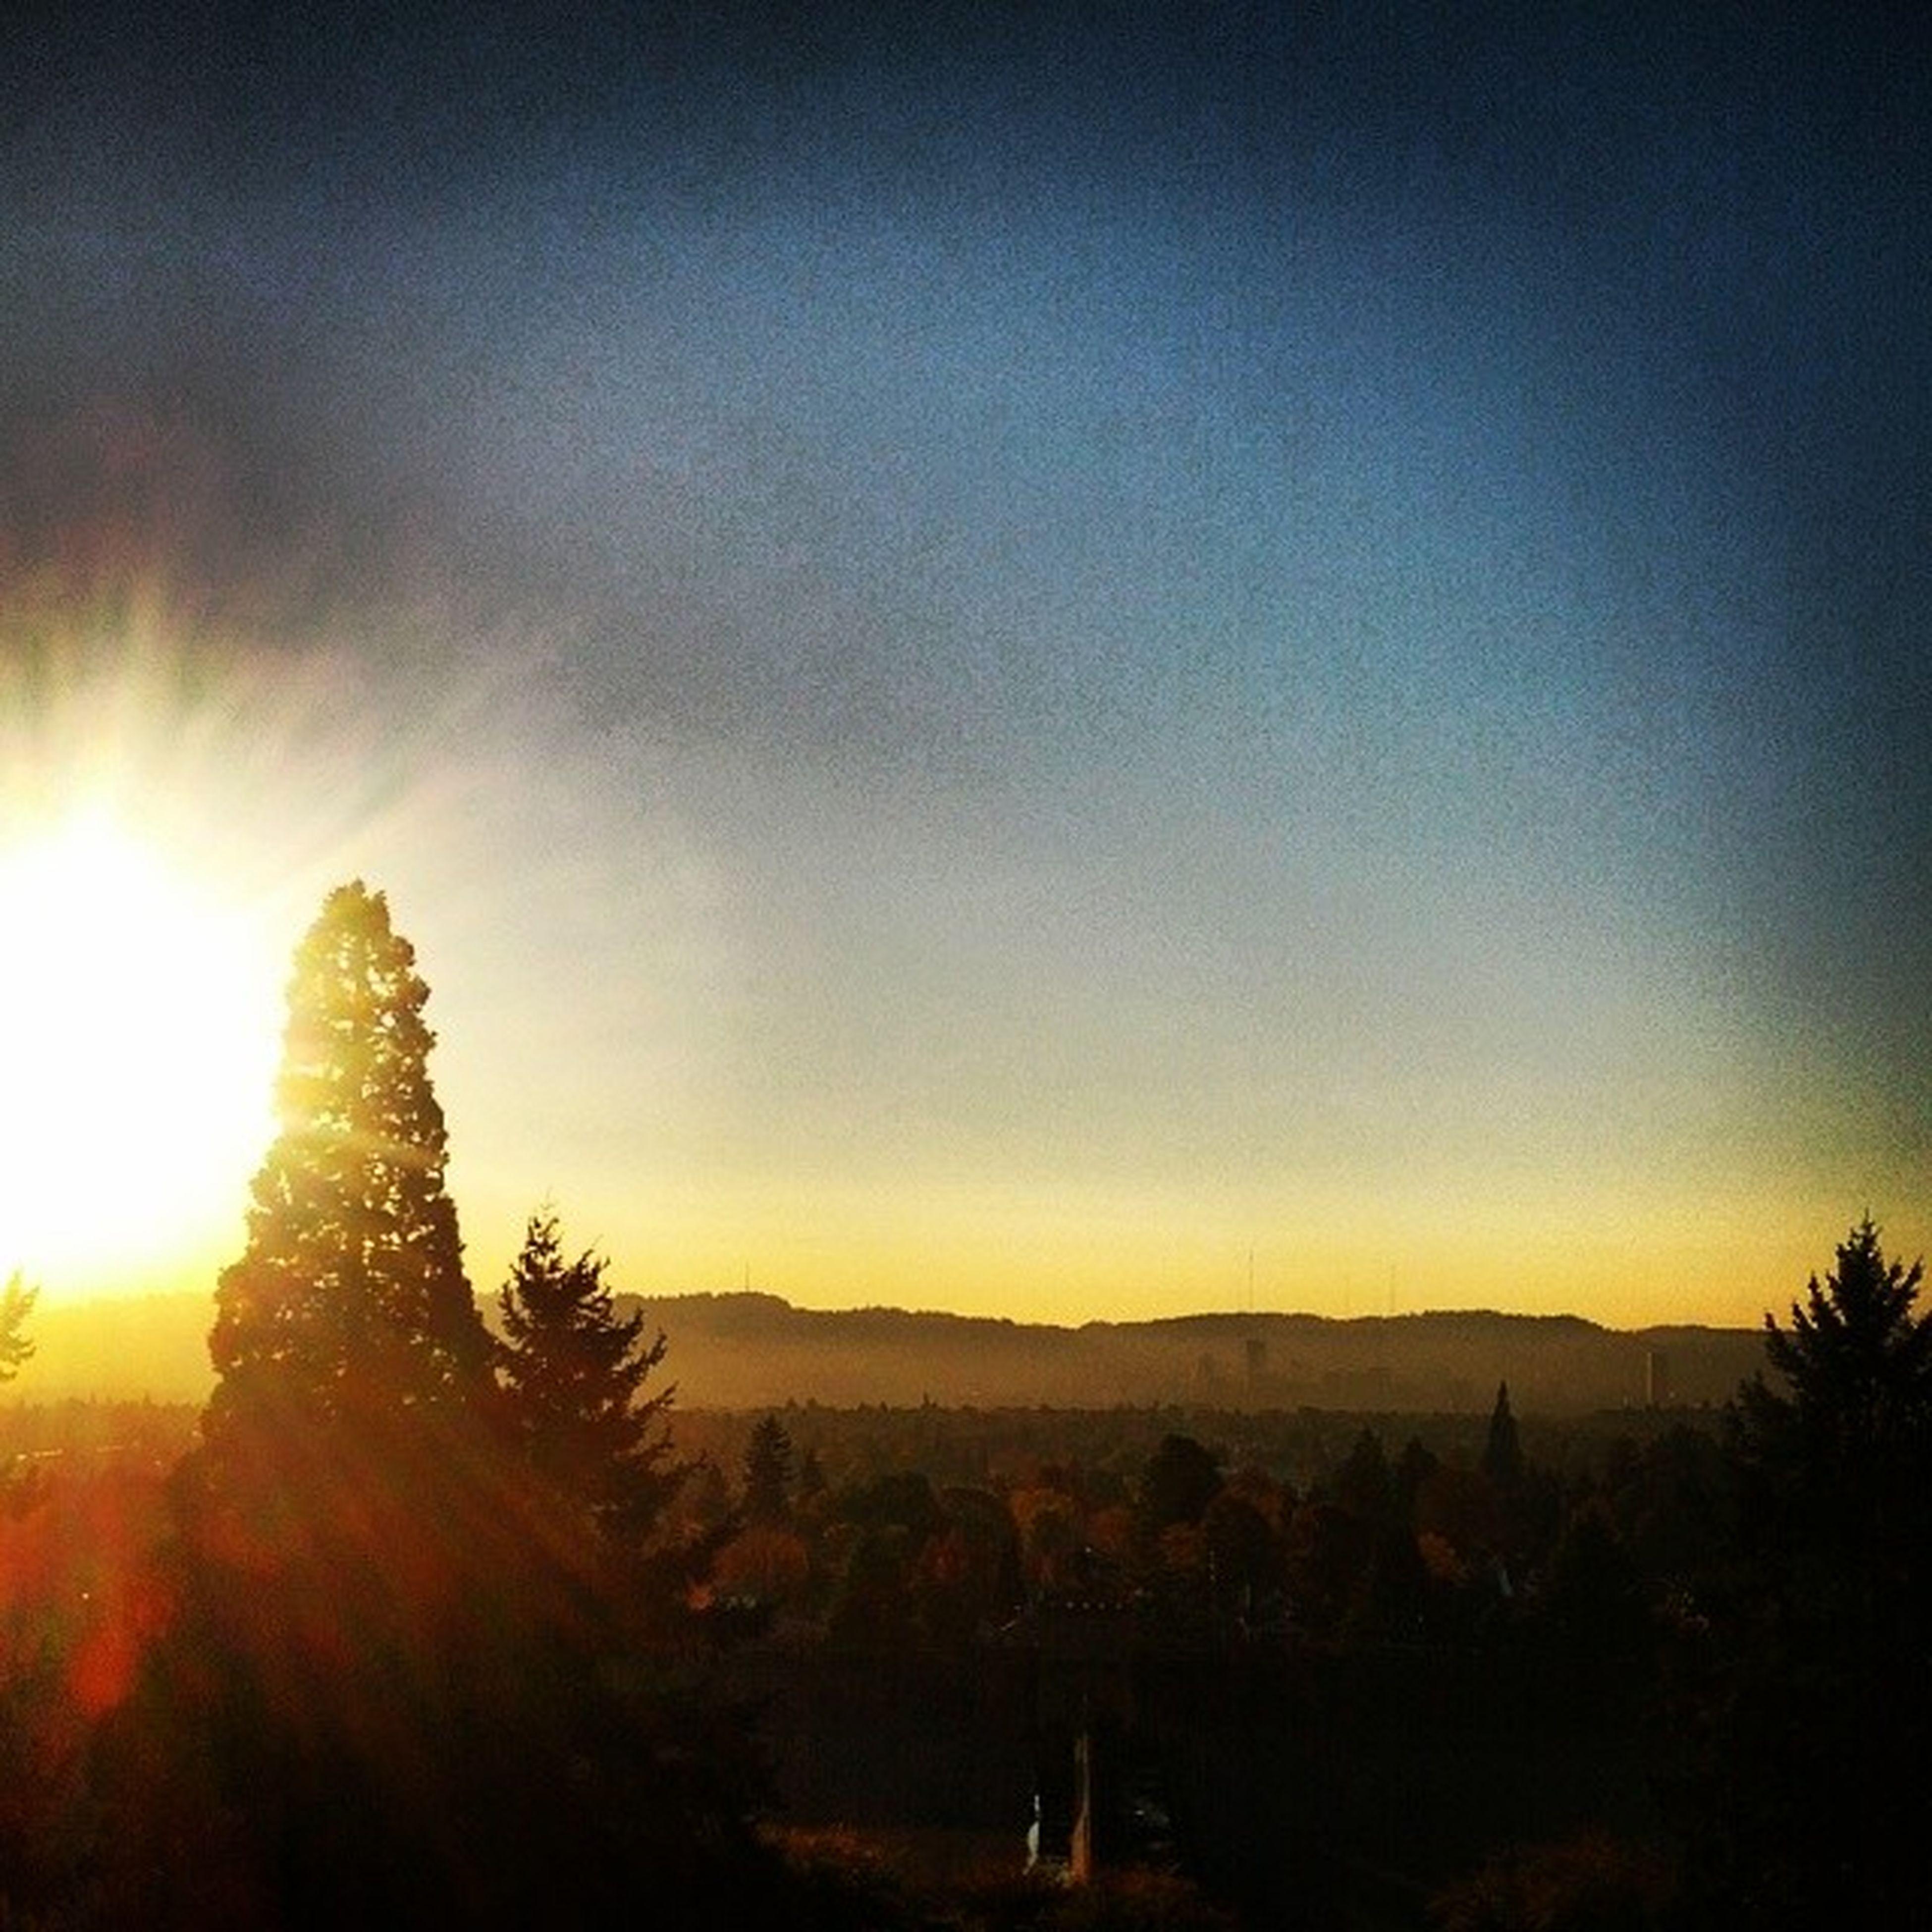 sunset, sun, tranquil scene, tranquility, scenics, silhouette, beauty in nature, landscape, tree, nature, sunbeam, sky, sunlight, idyllic, mountain, copy space, orange color, non-urban scene, lens flare, clear sky